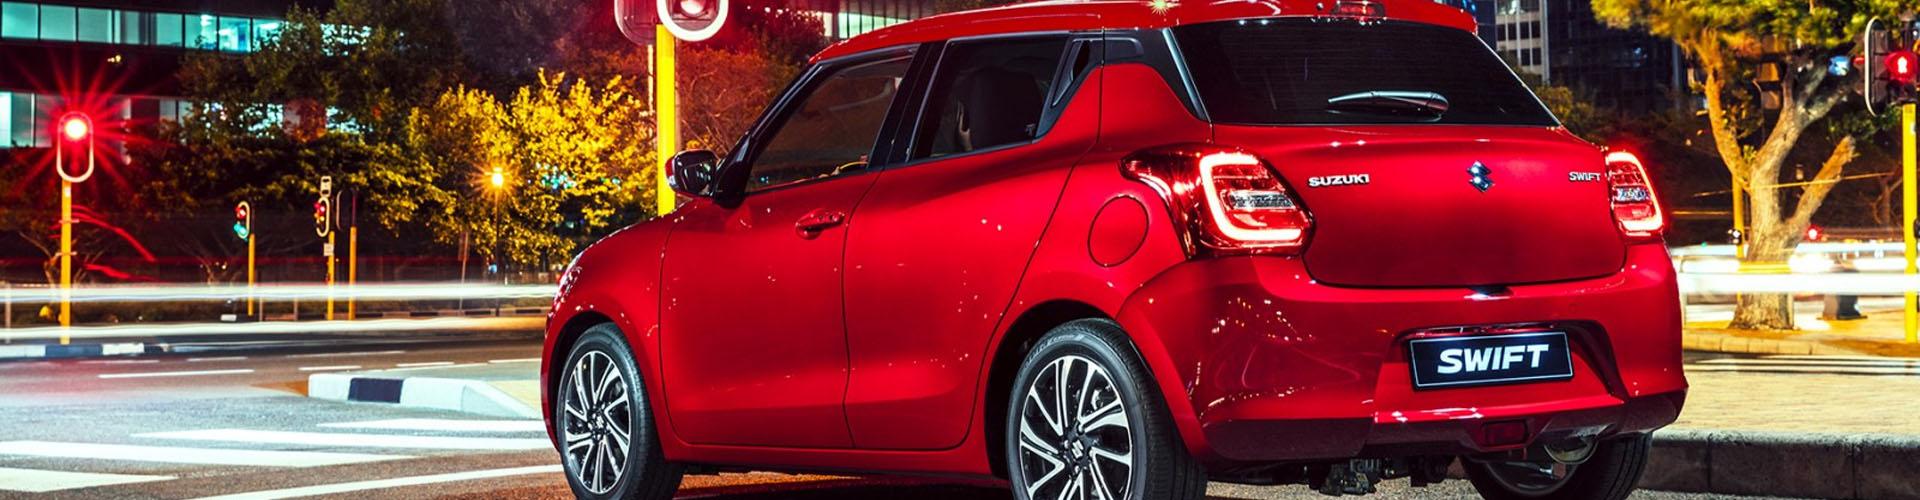 Suzuki QLD Swift